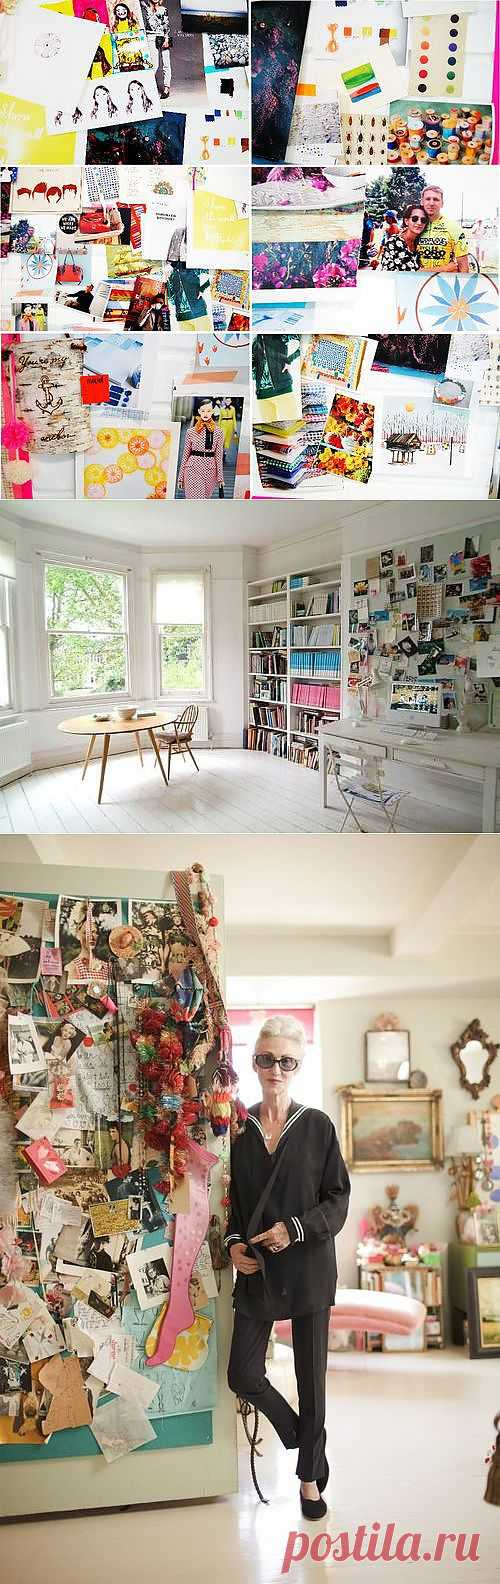 make an inspiration wall - wise craft